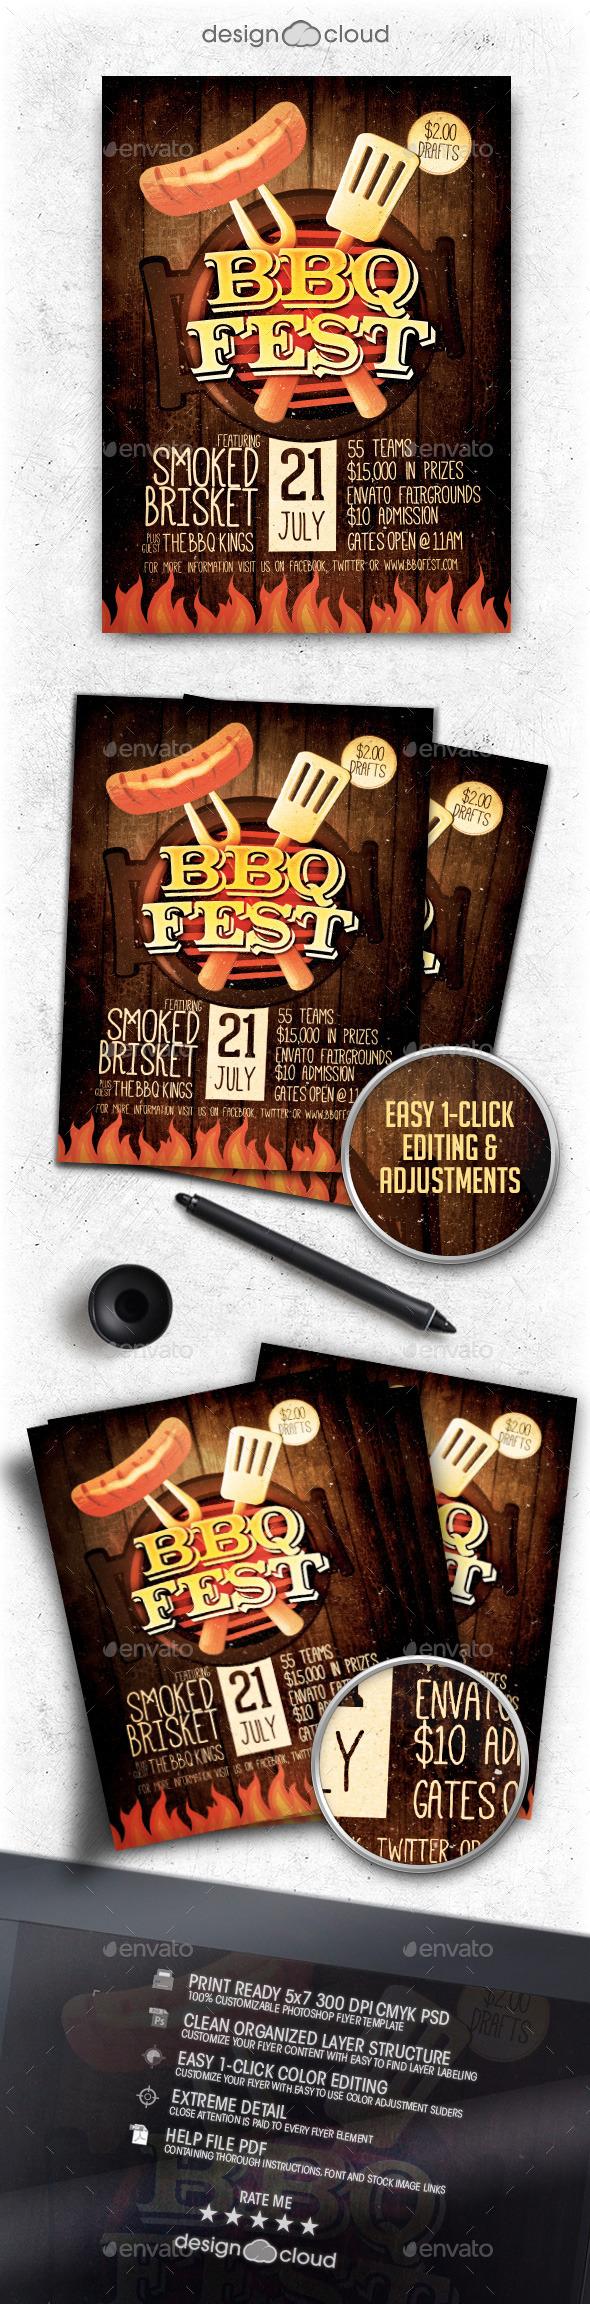 BBQ Festival Flyer Template Vol. 1 - Miscellaneous Events